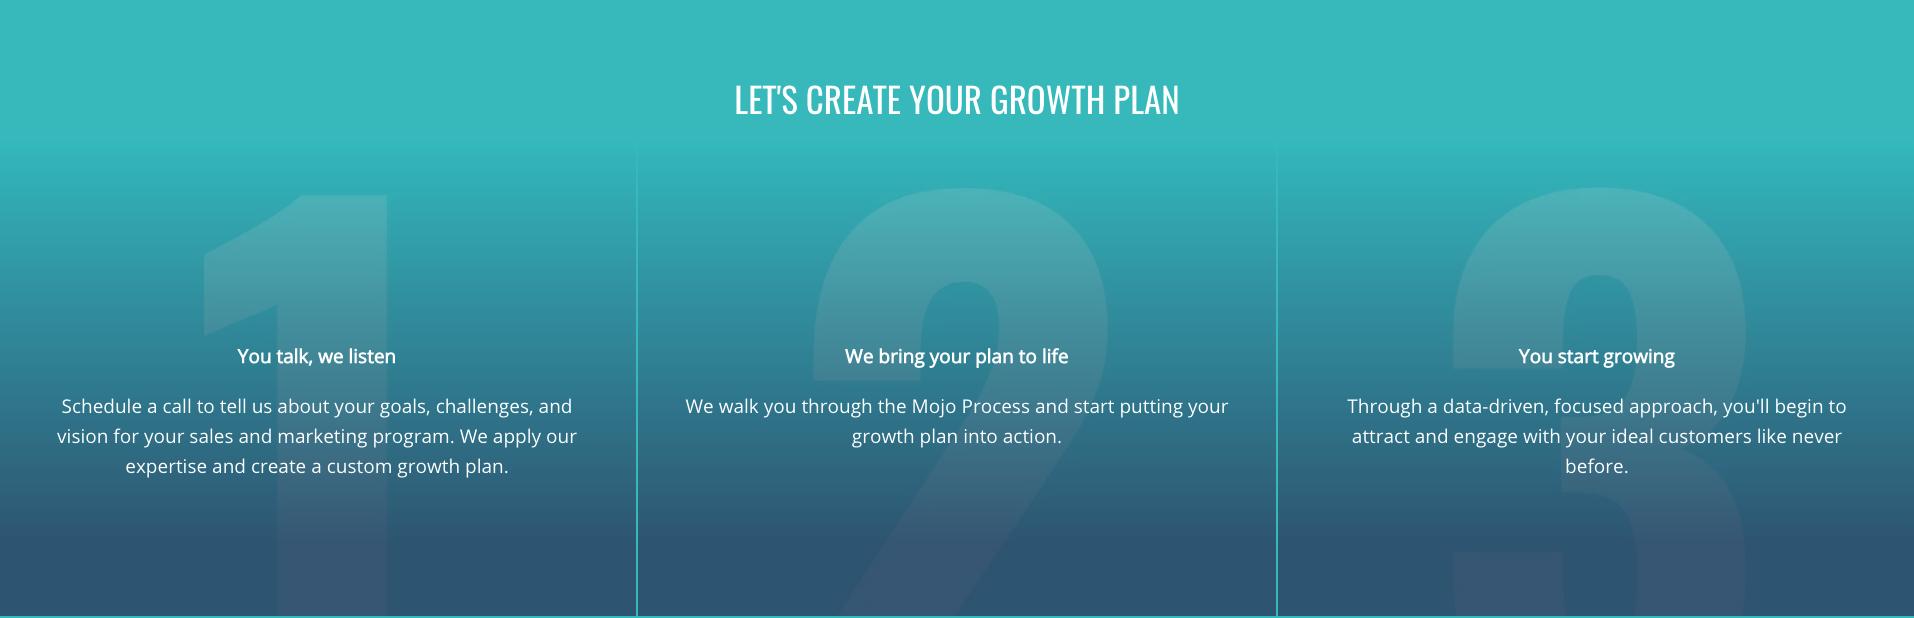 3-Step-Growth-Plan-Mojo-Media-Labs